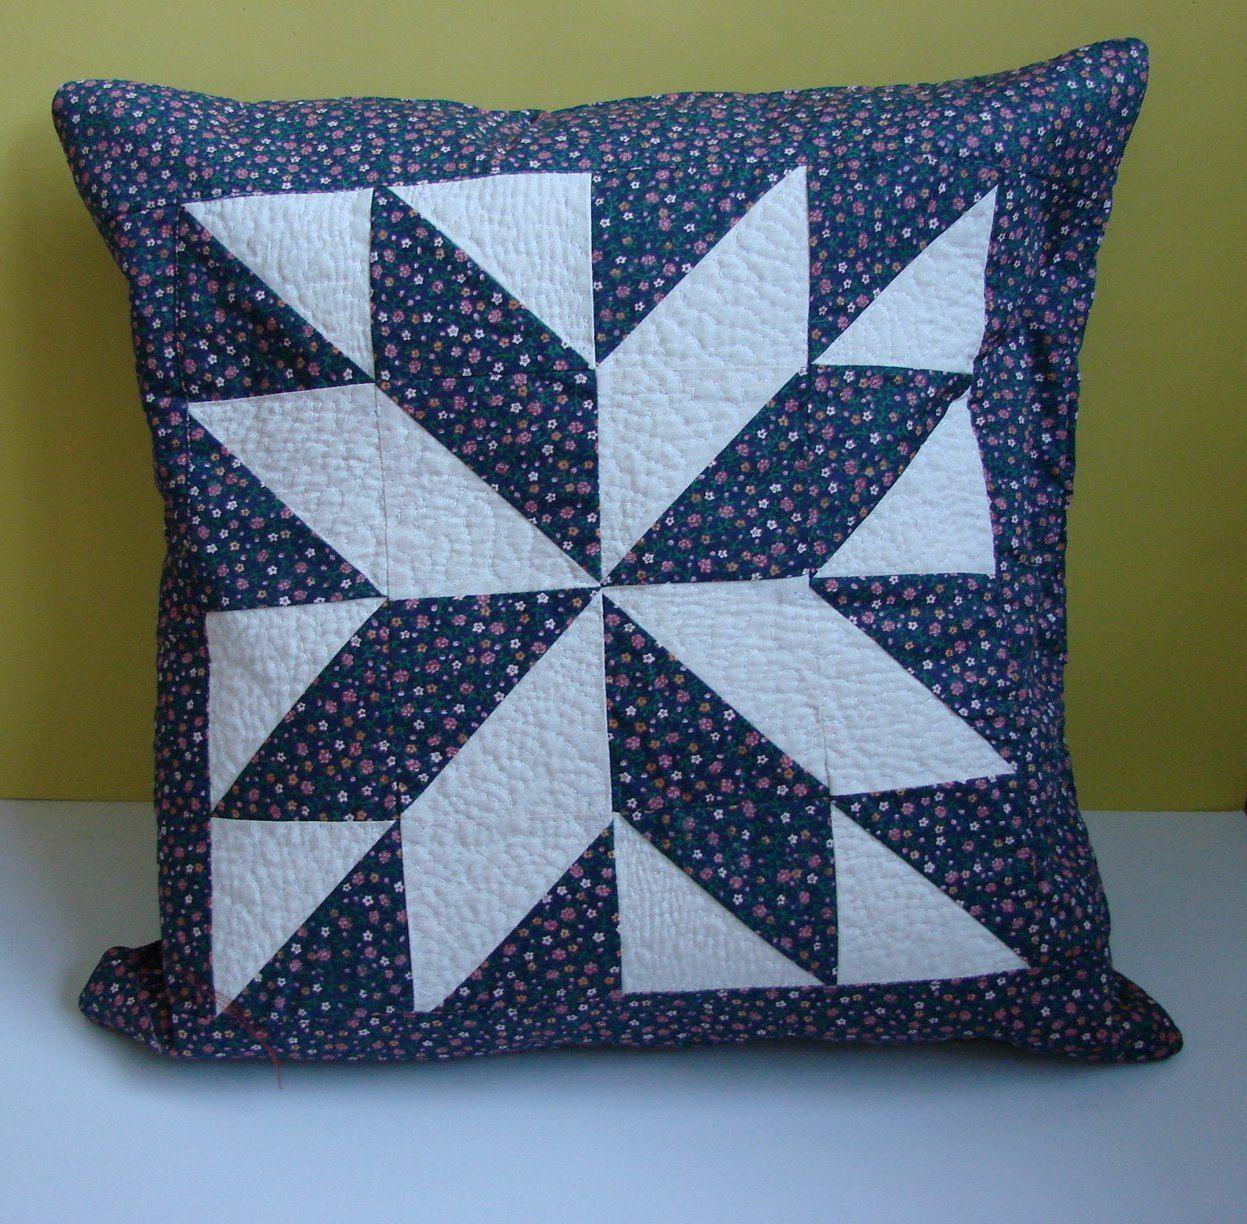 almofada em patchwork pillows pinterest kissen. Black Bedroom Furniture Sets. Home Design Ideas